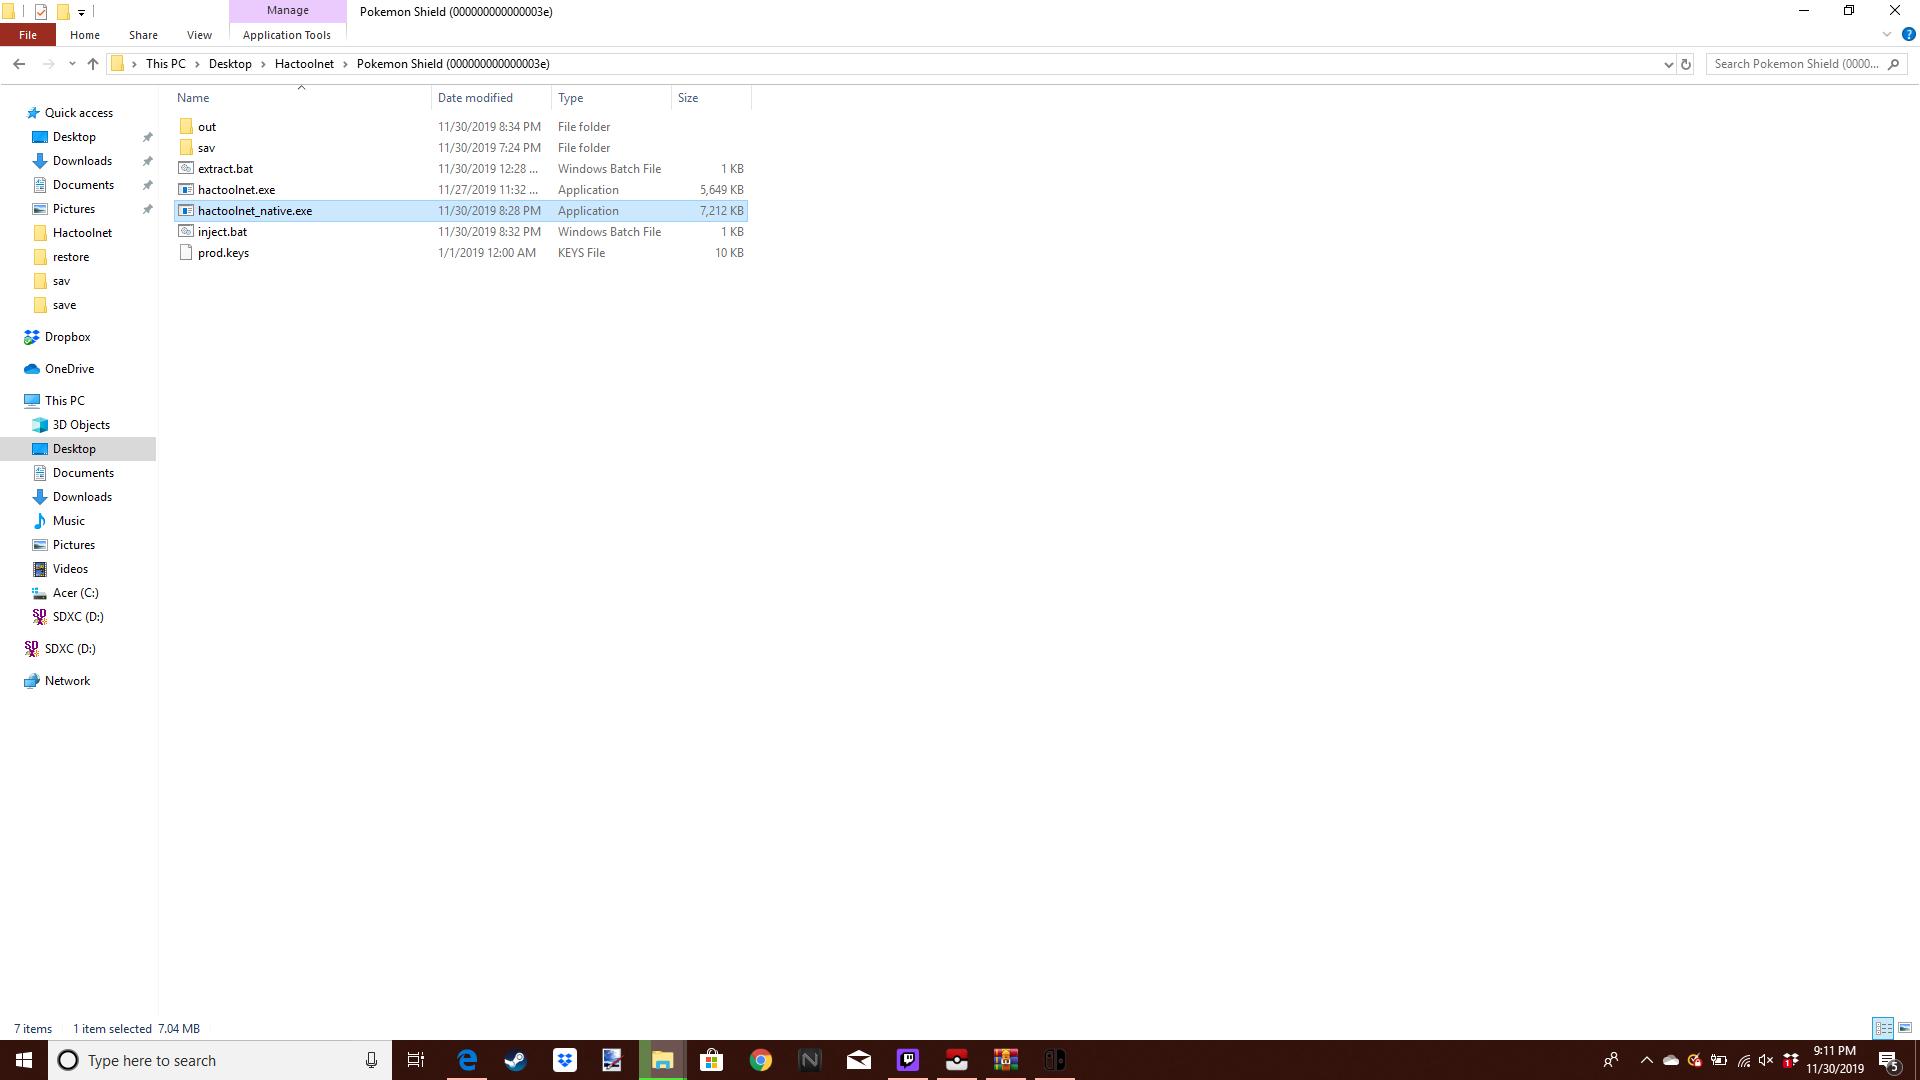 hactoolnet screenshot.png